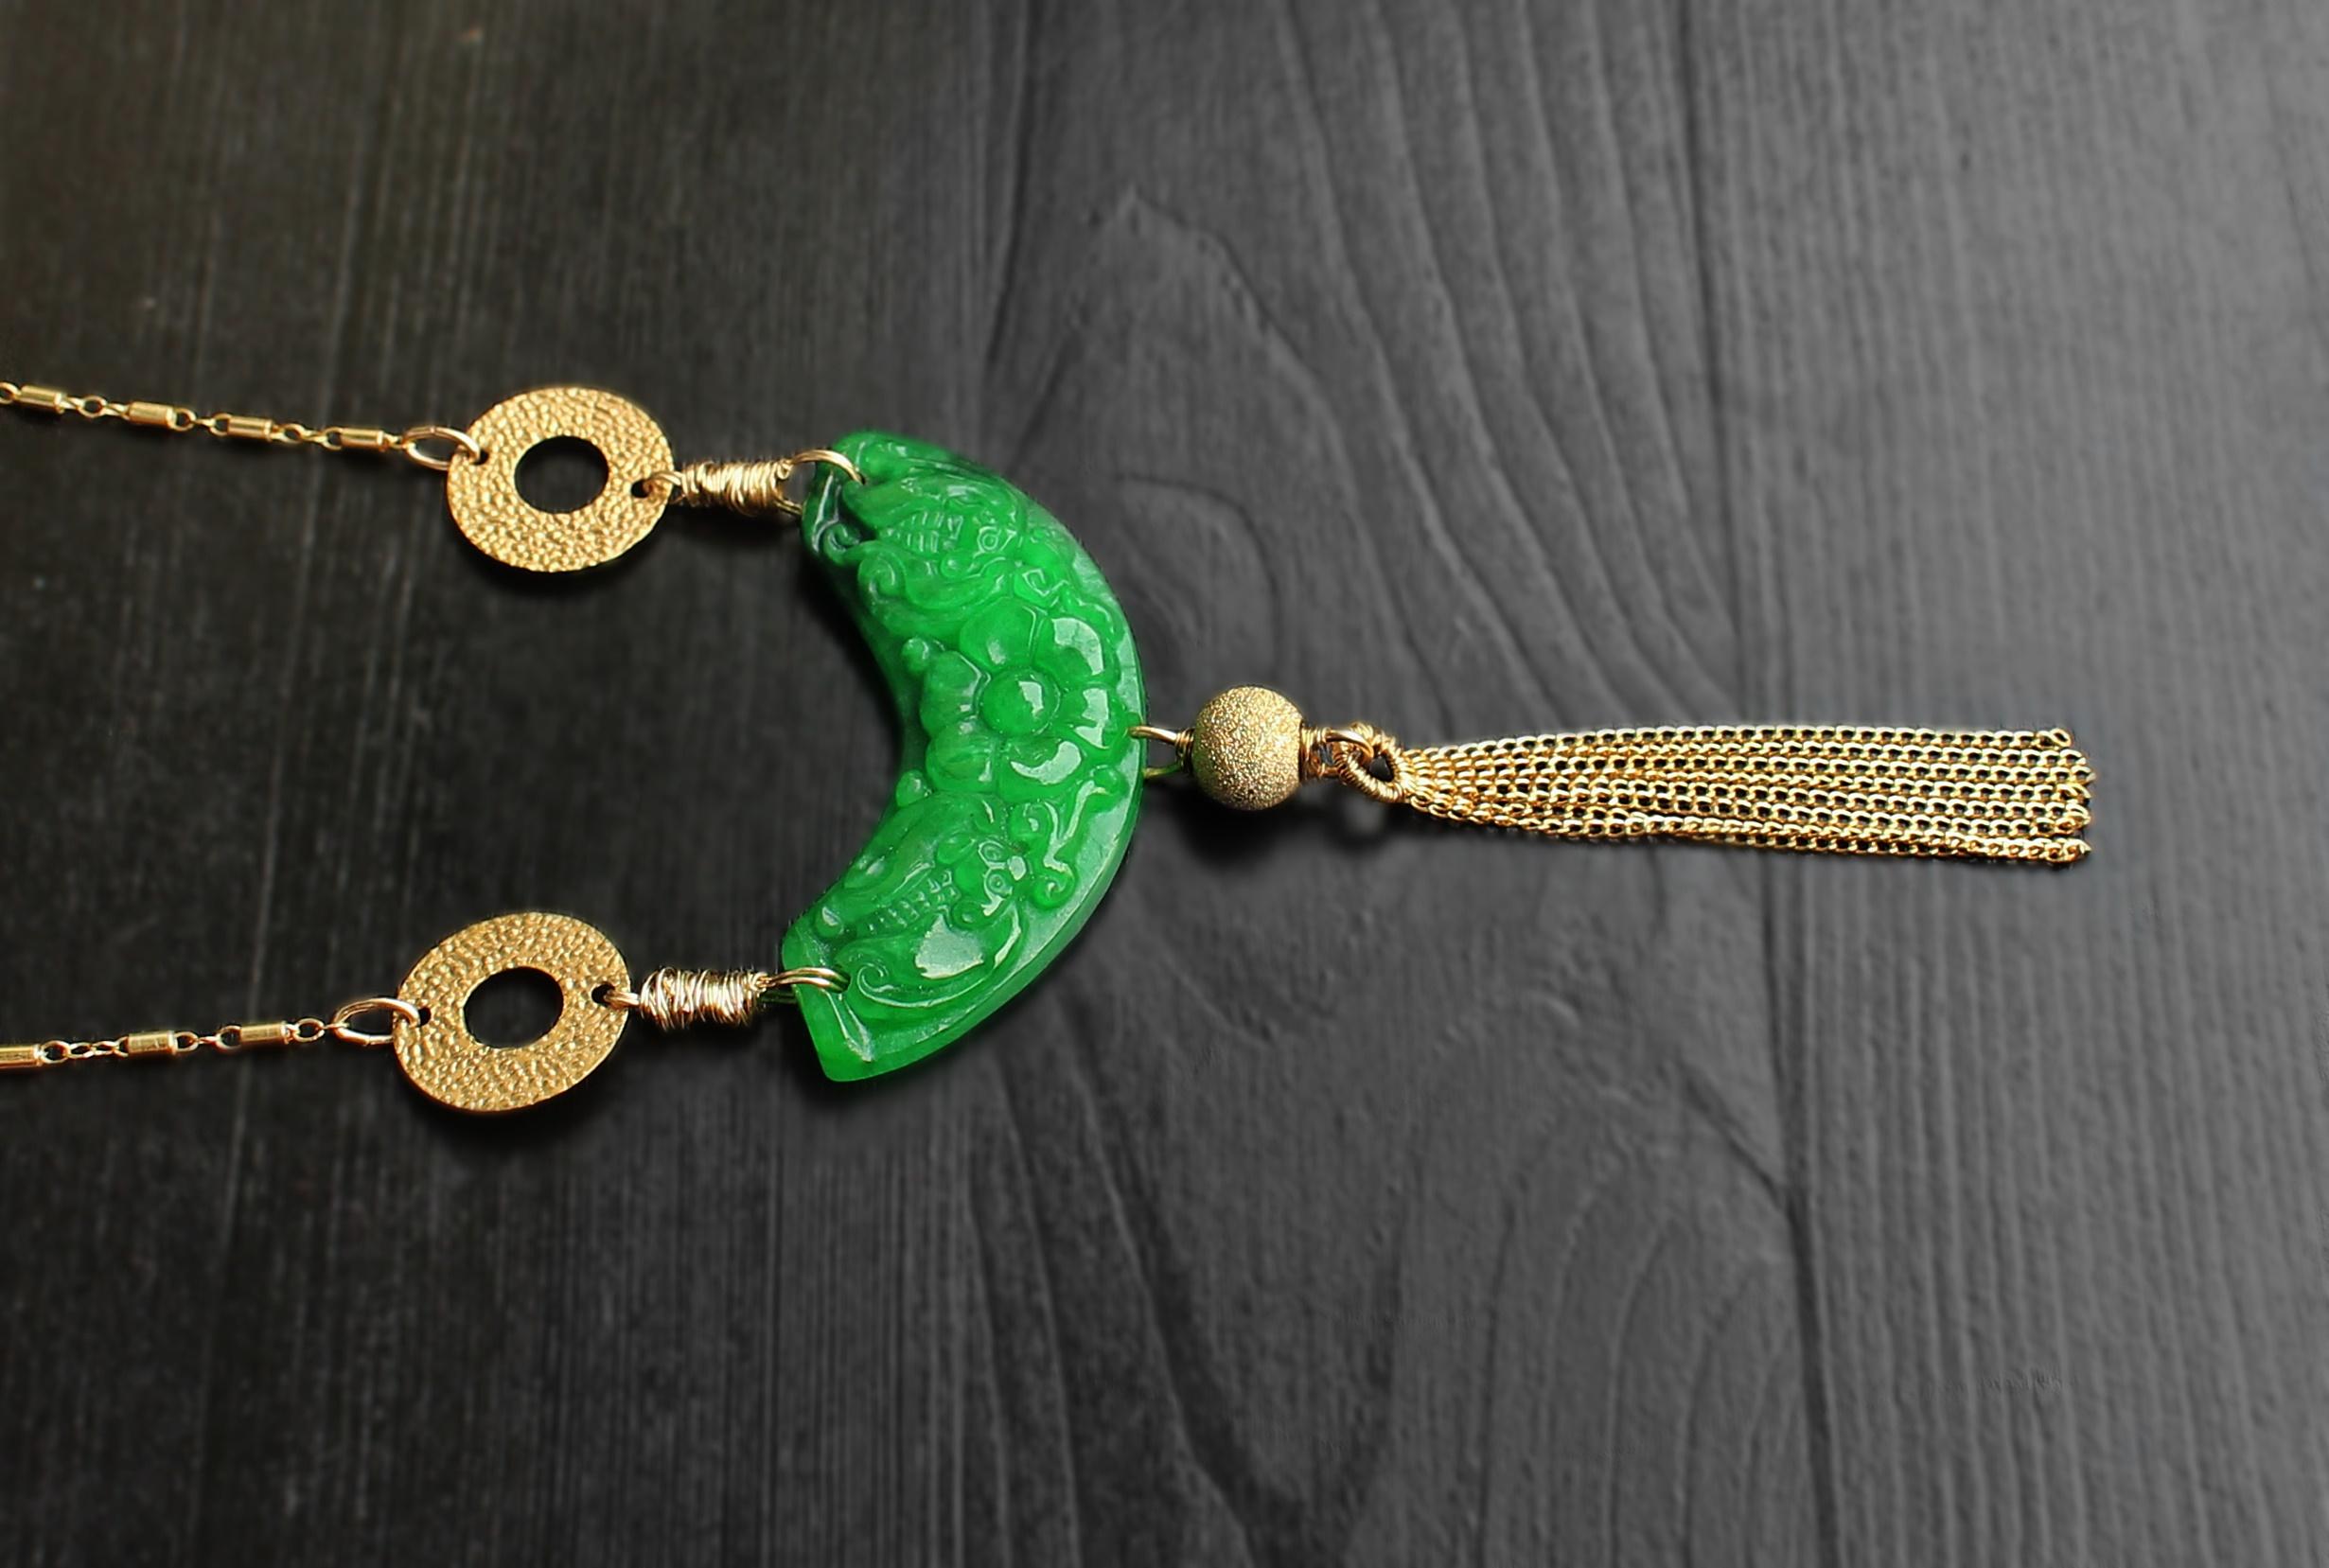 Jade Arch 14K Gold Filled Necklace